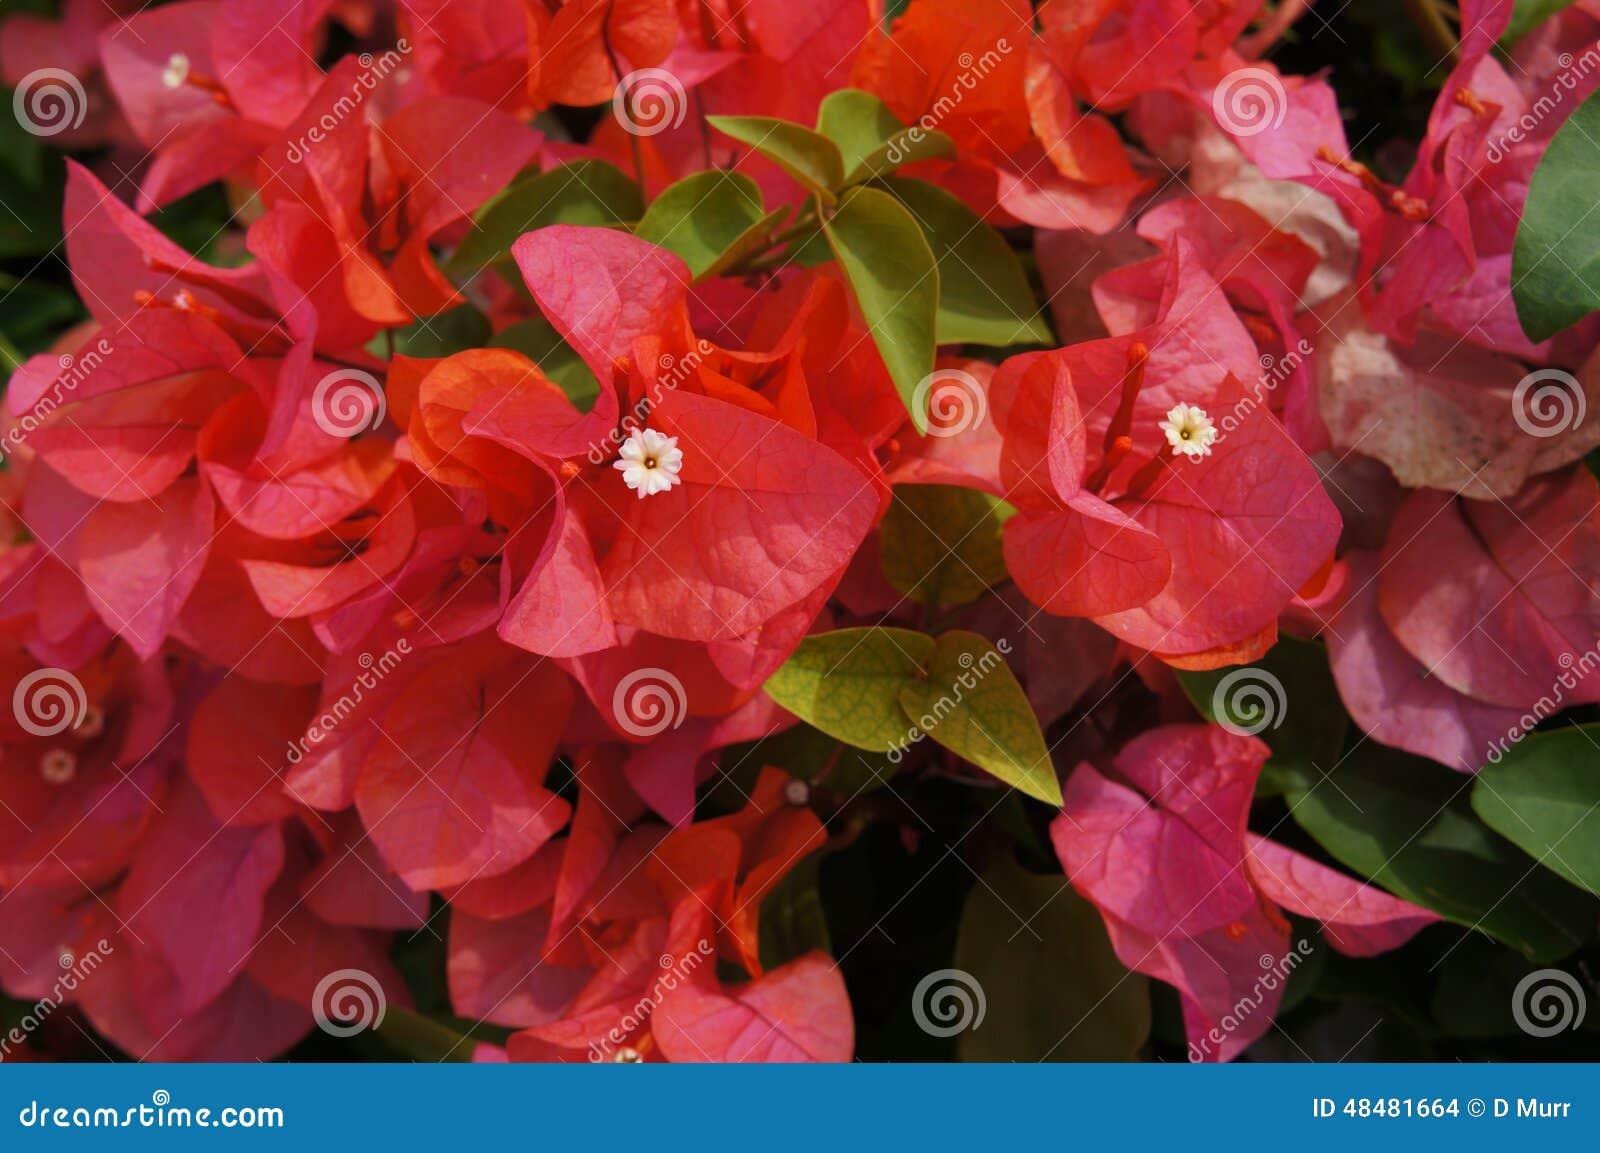 Beautiful red hawaiian island flowers stock photo image of leaves beautiful red hawaiian island flowers izmirmasajfo